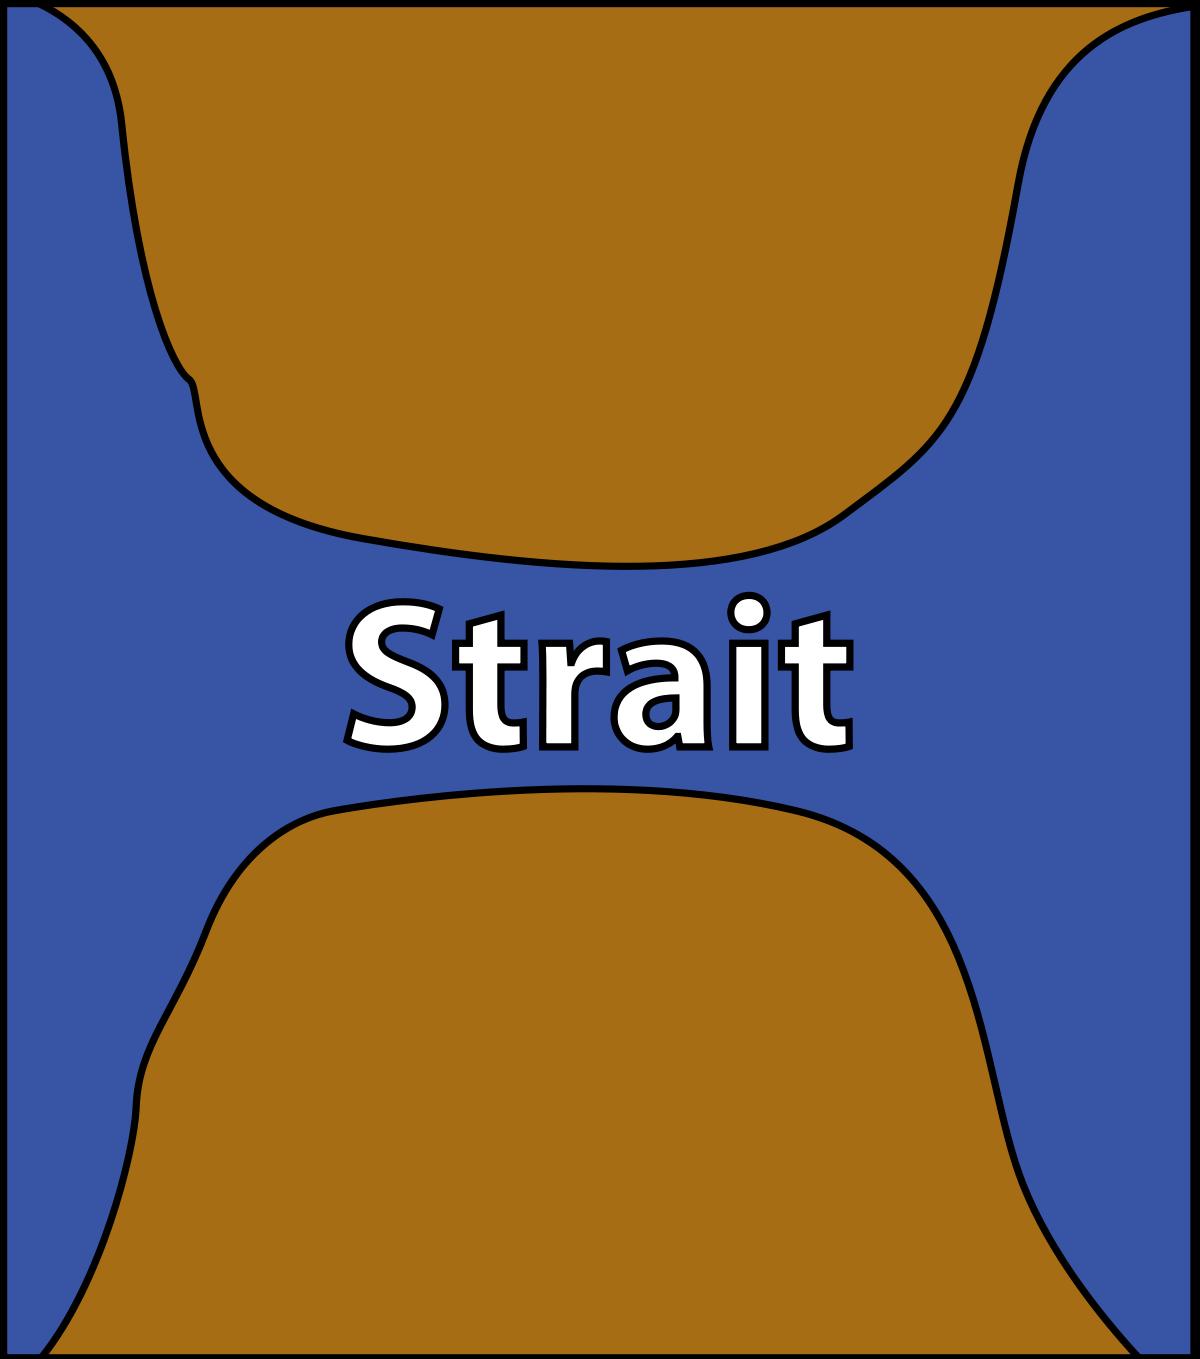 Strait Of Gibraltar svg #2, Download drawings